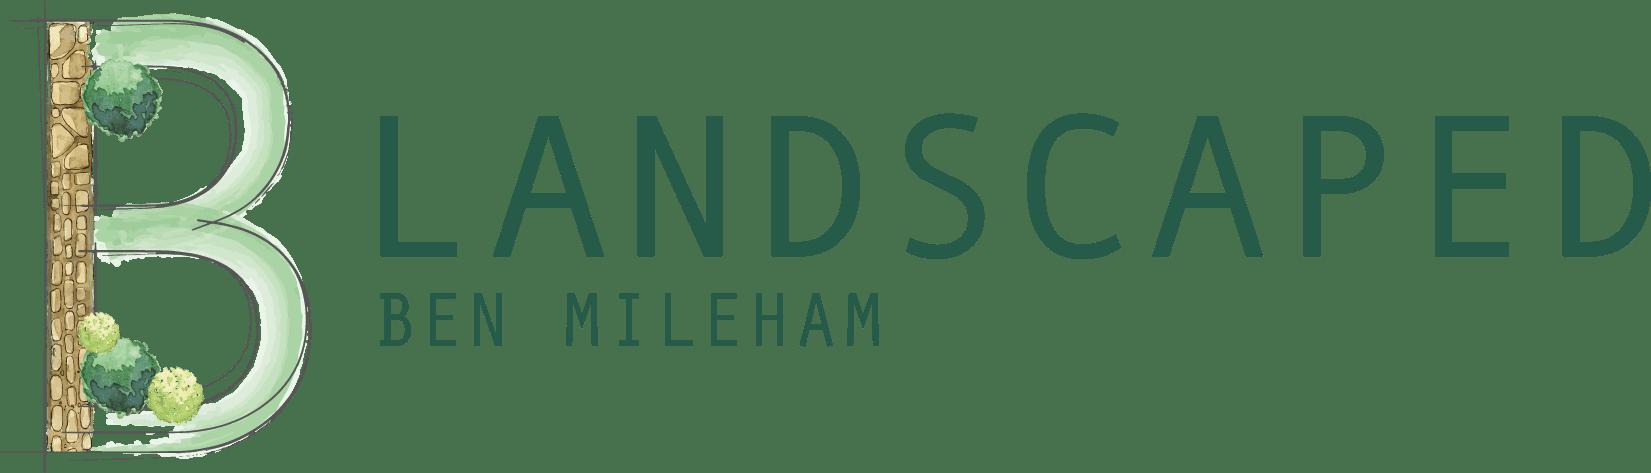 B-Landscaping | Ben Mileham –  garden design and landscaping service